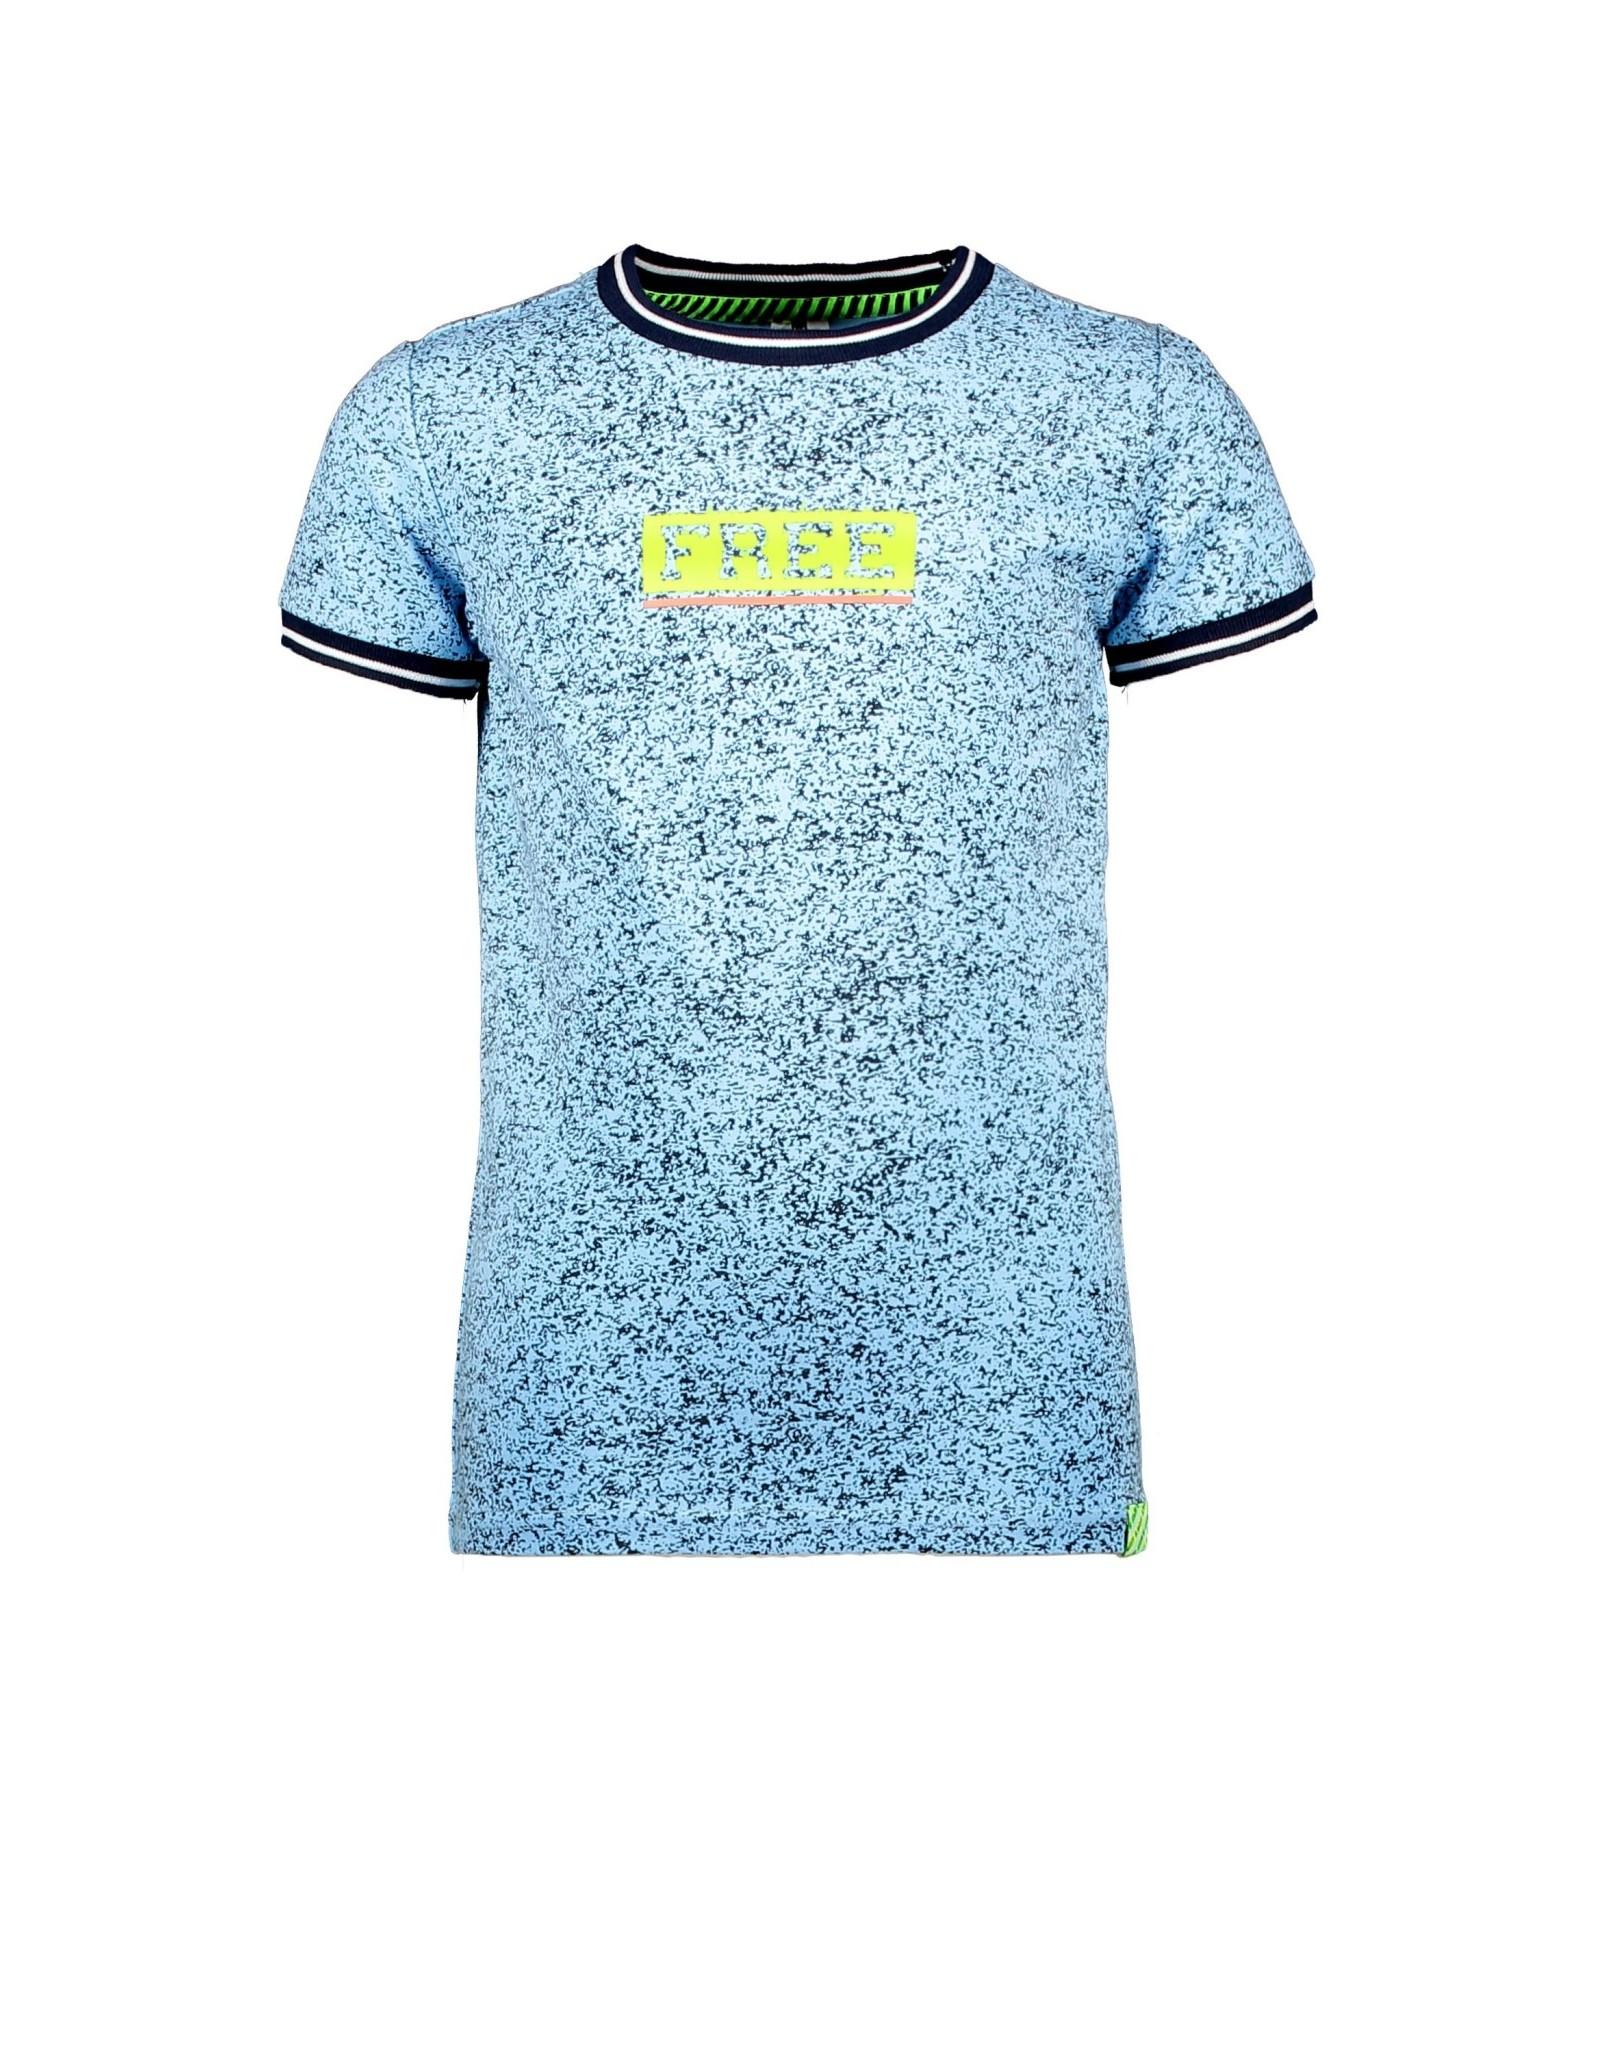 B.Nosy B.Nosy jongens t-shirt Free Melee Alaska Blue